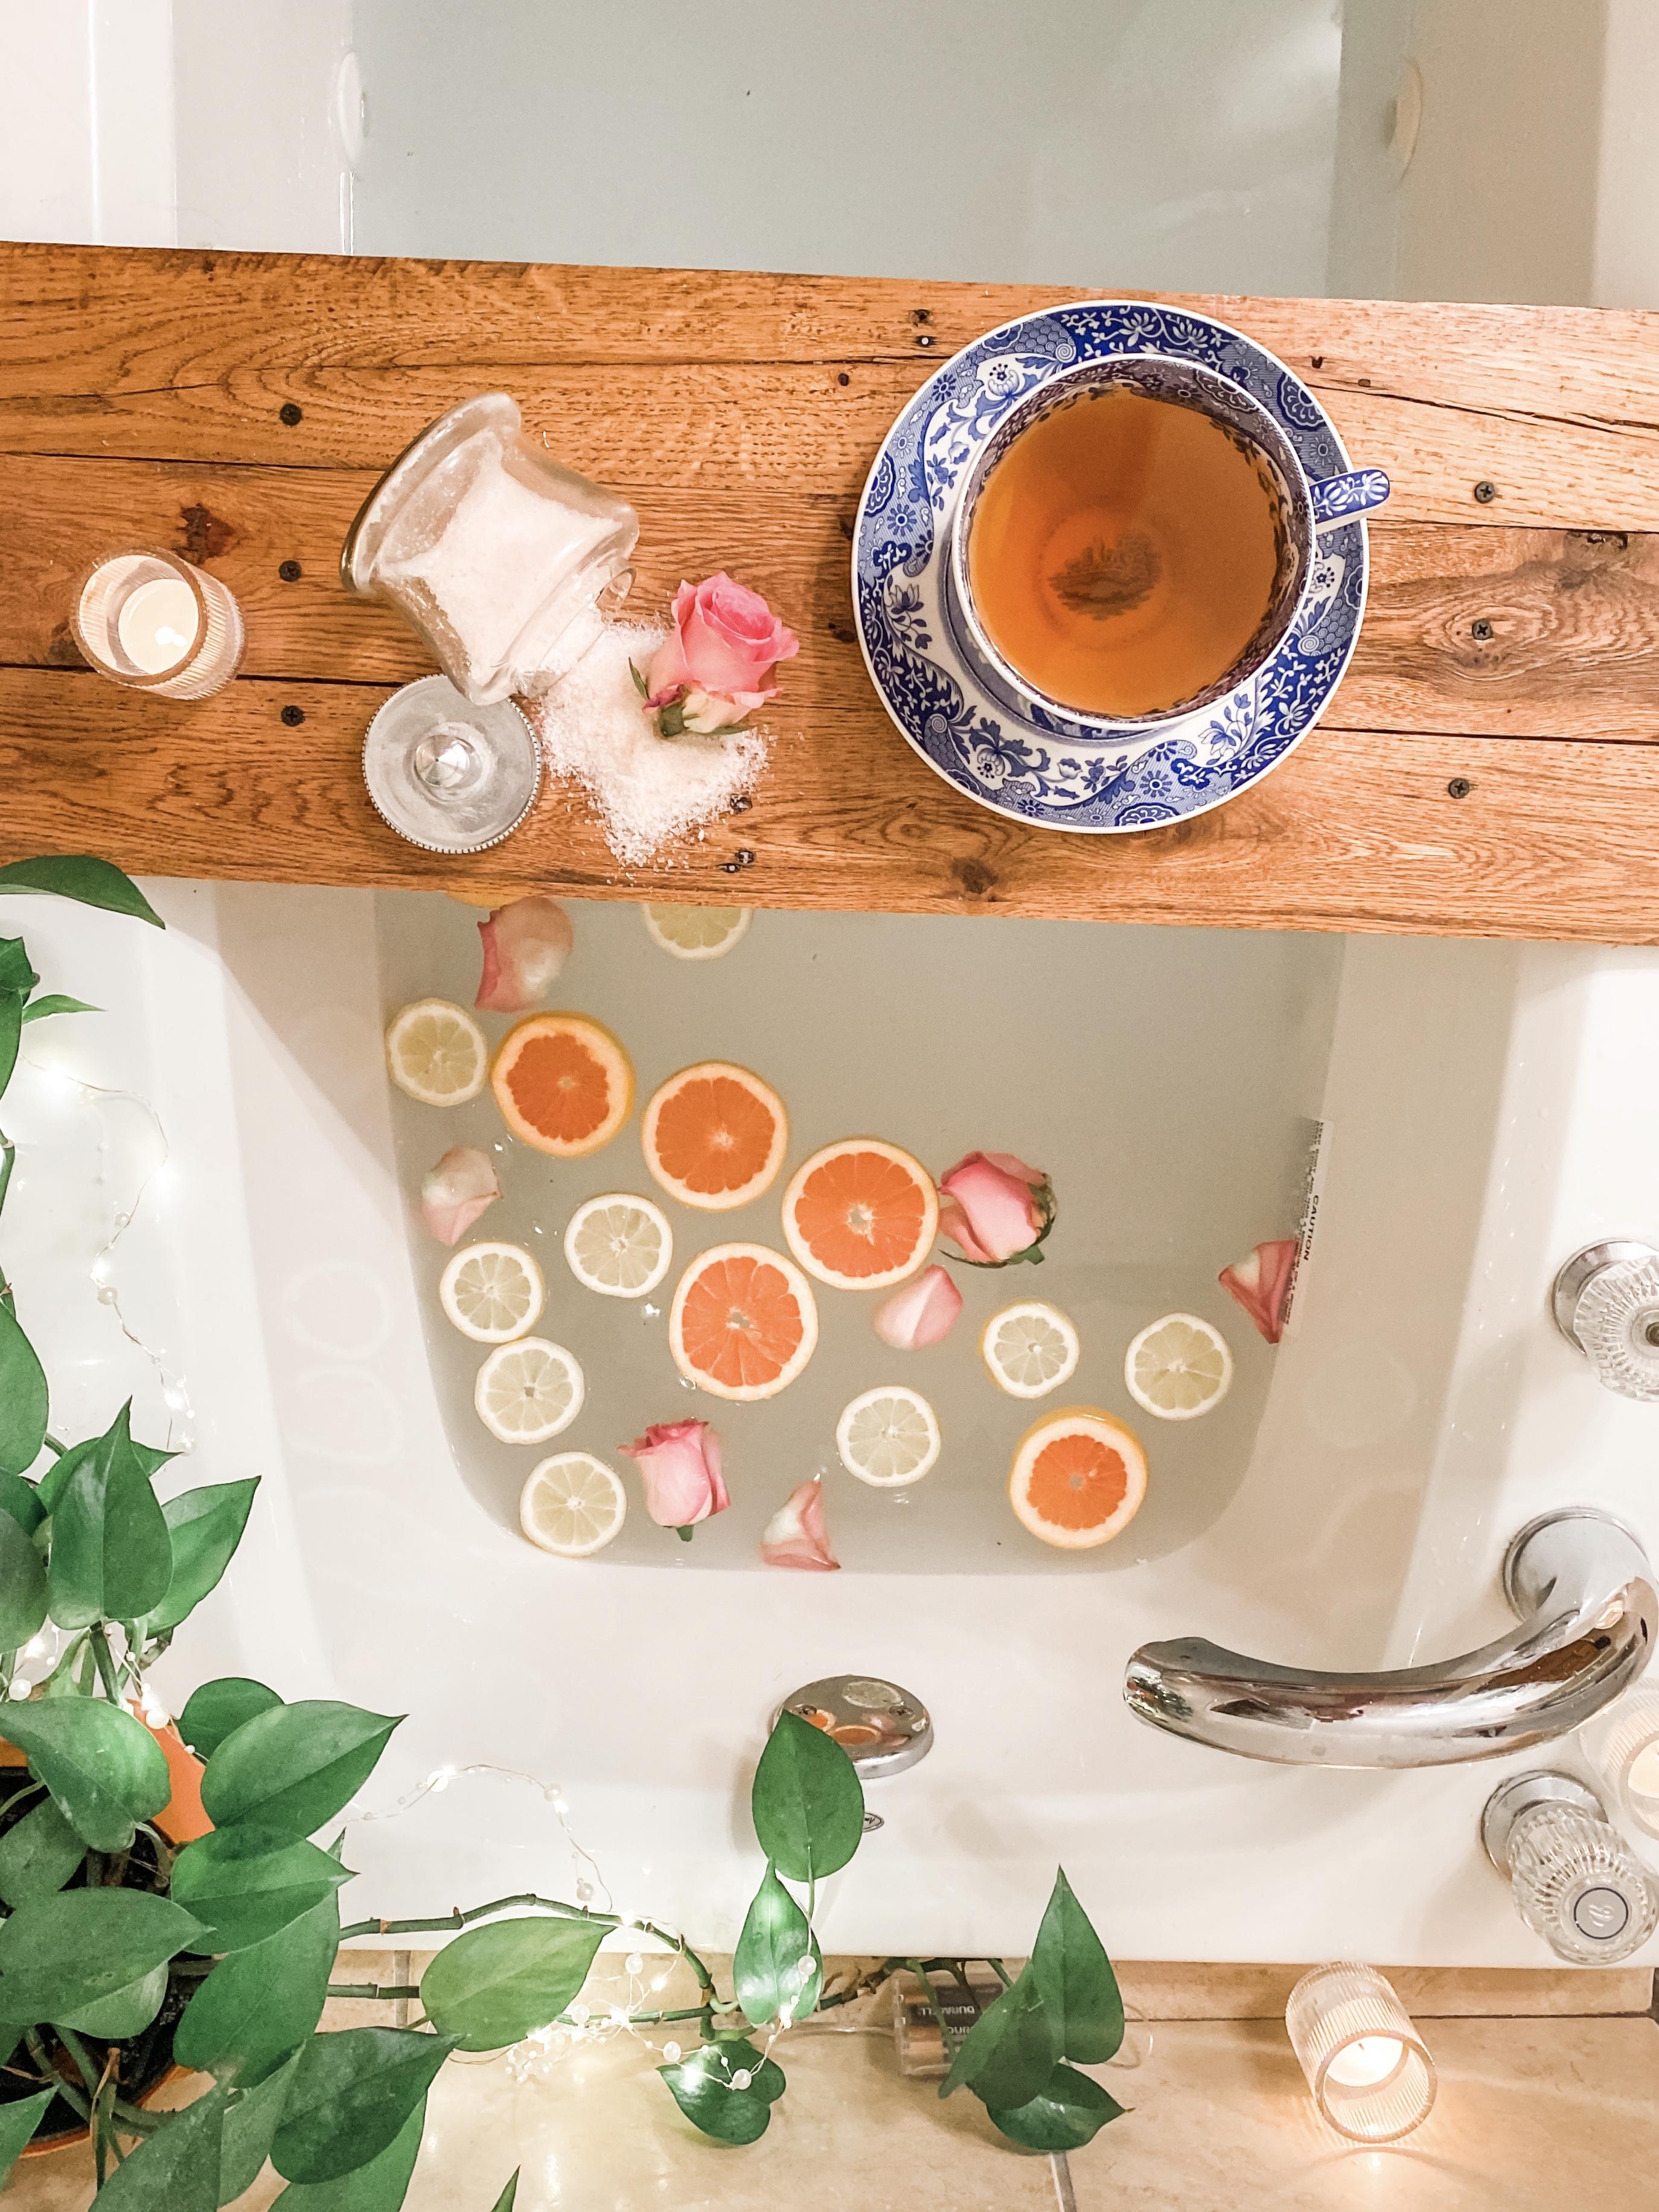 Bathtime / ohfiddledeedee.com